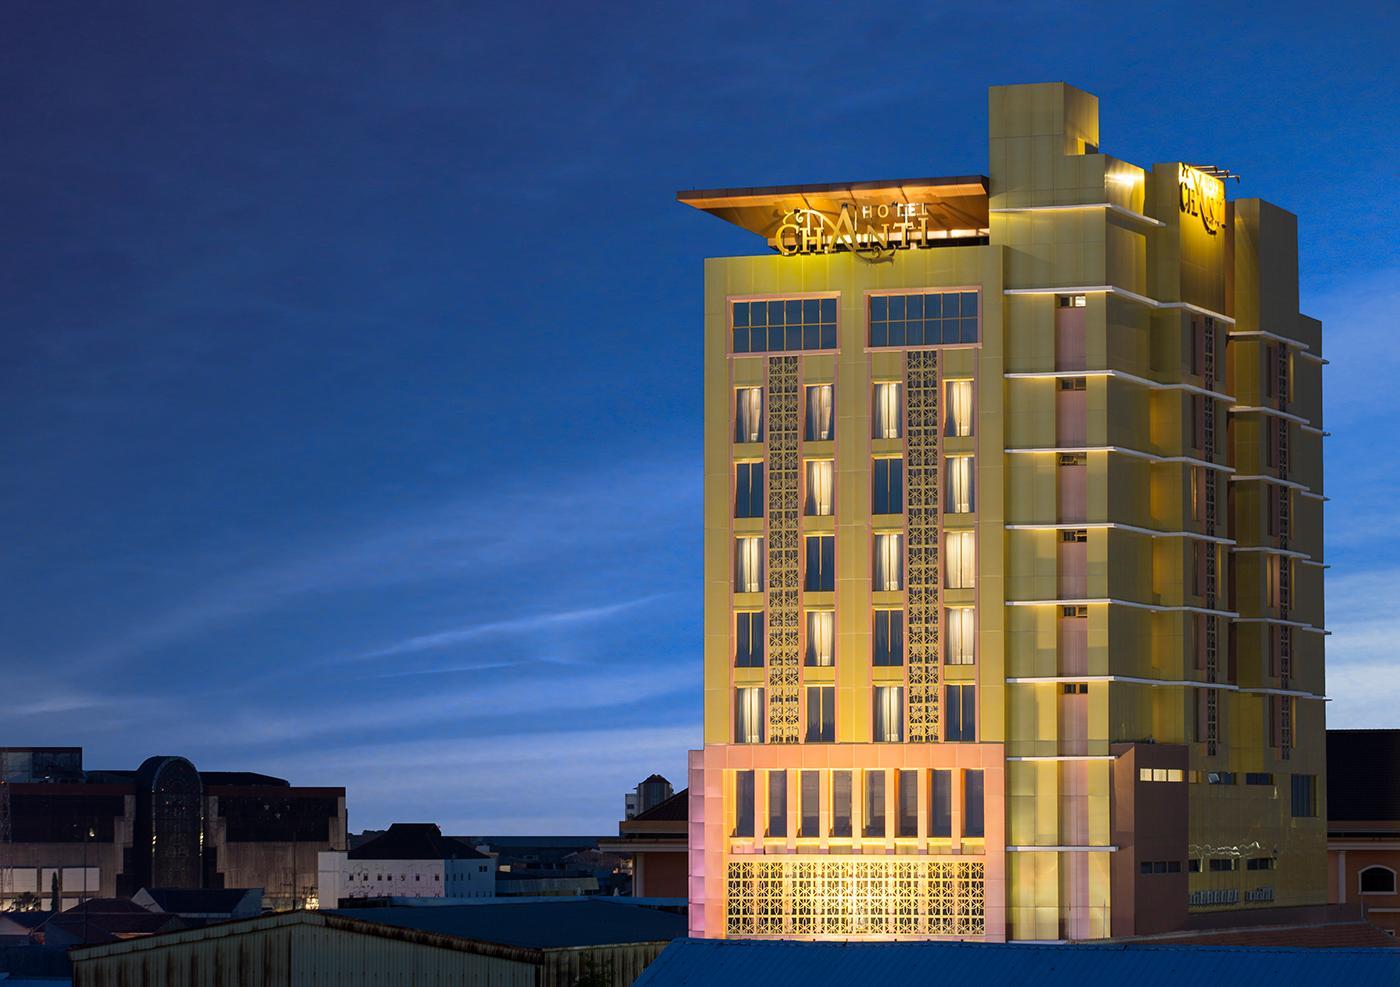 Hotel Chanti Managed By Tentrem Hotel Management Indonesia Semarang Promo Terbaru 2020 Rp 386054 Foto Hd Ulasan